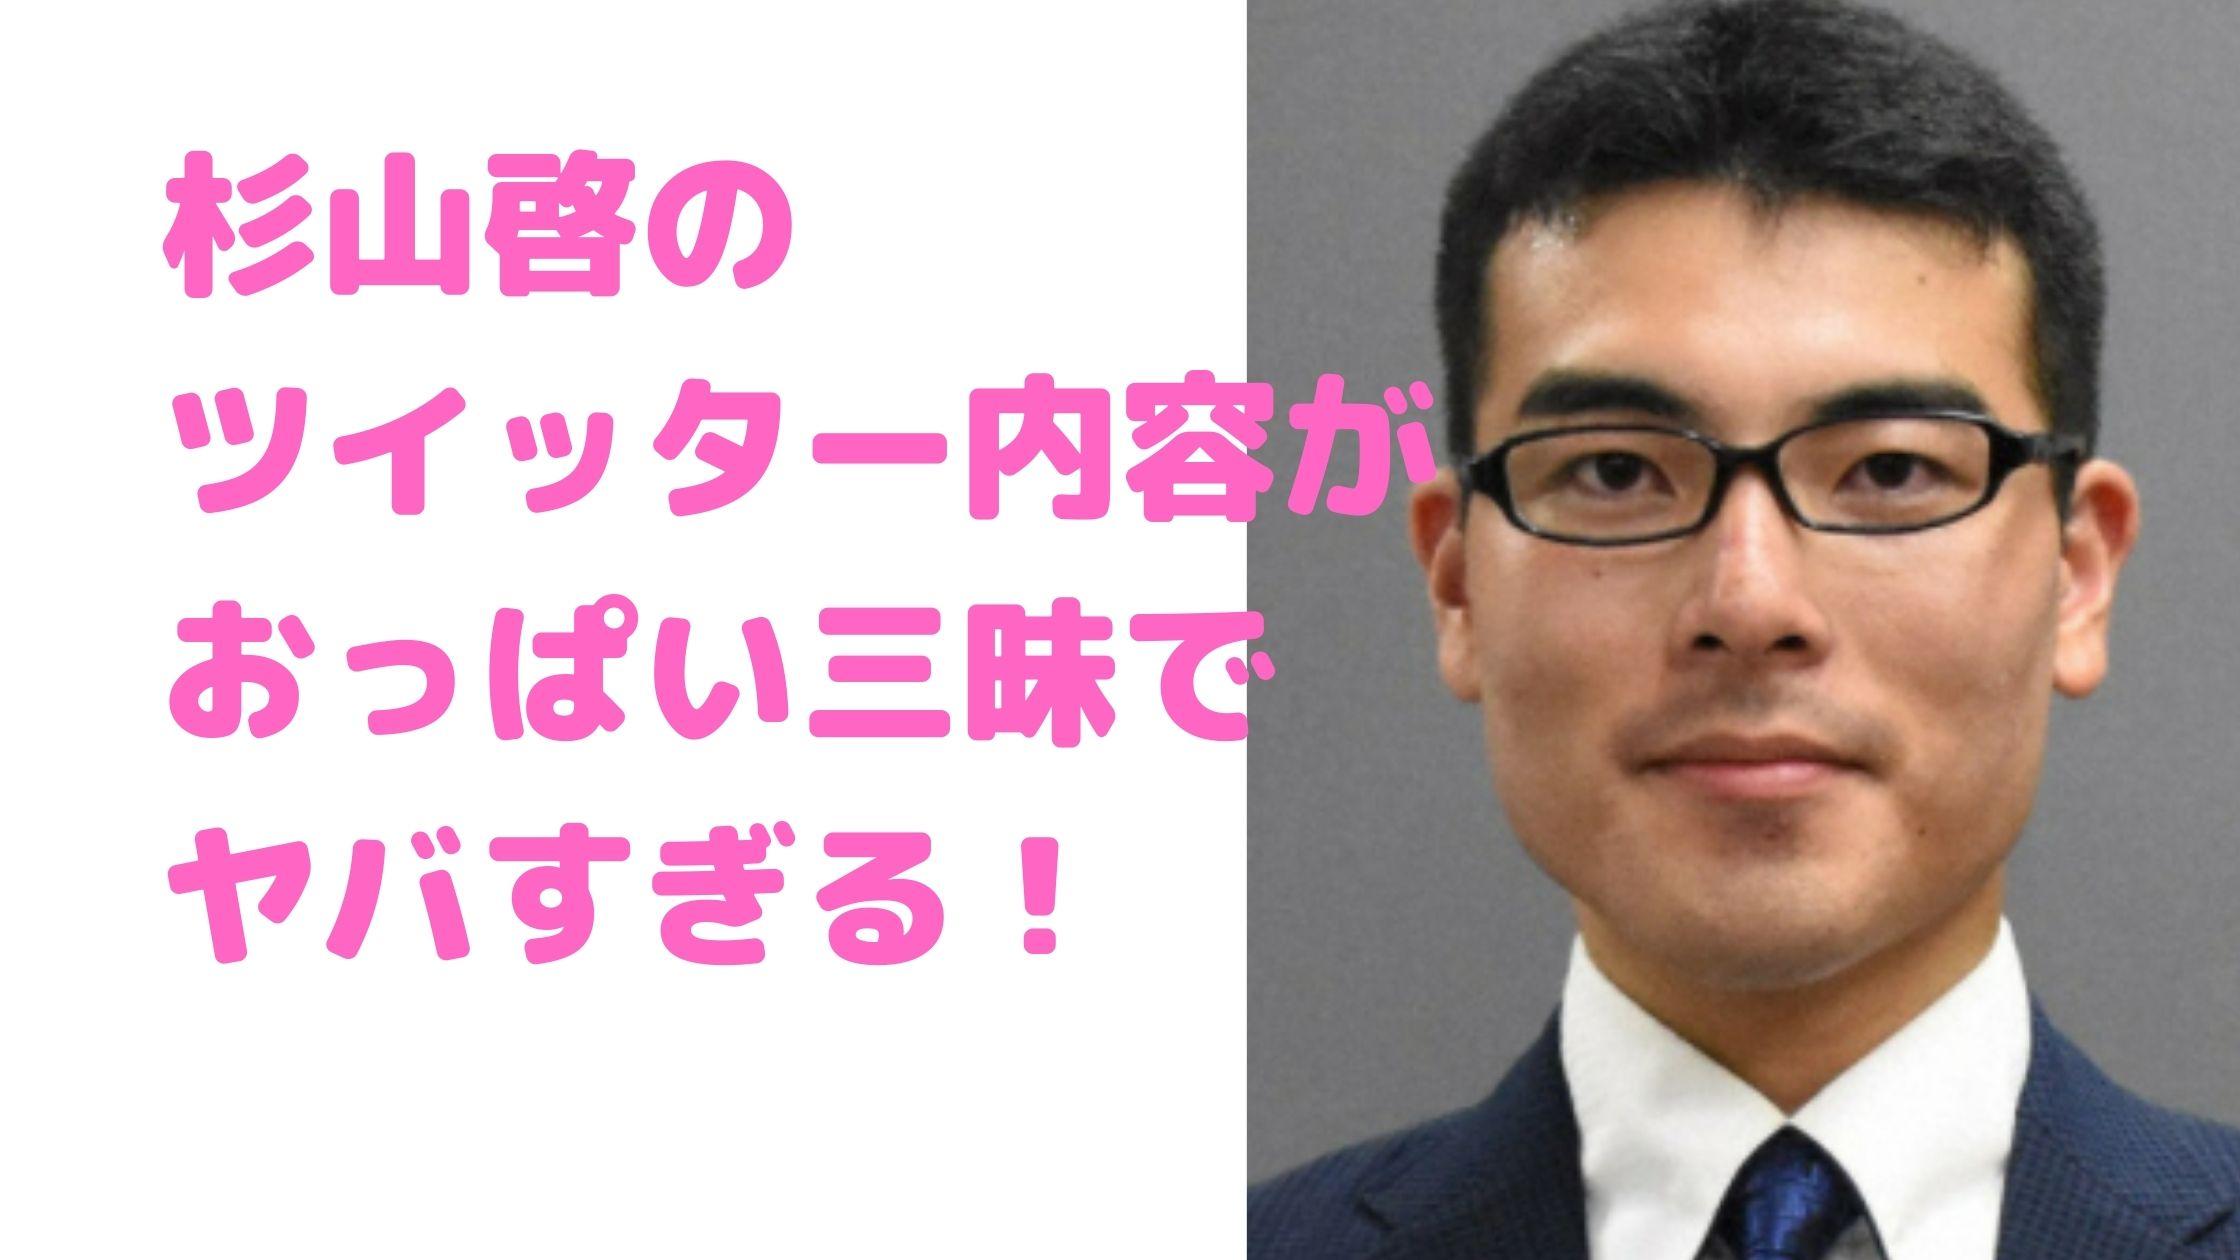 杉山啓 ツイッター内容 嫁 子供 学歴 経歴